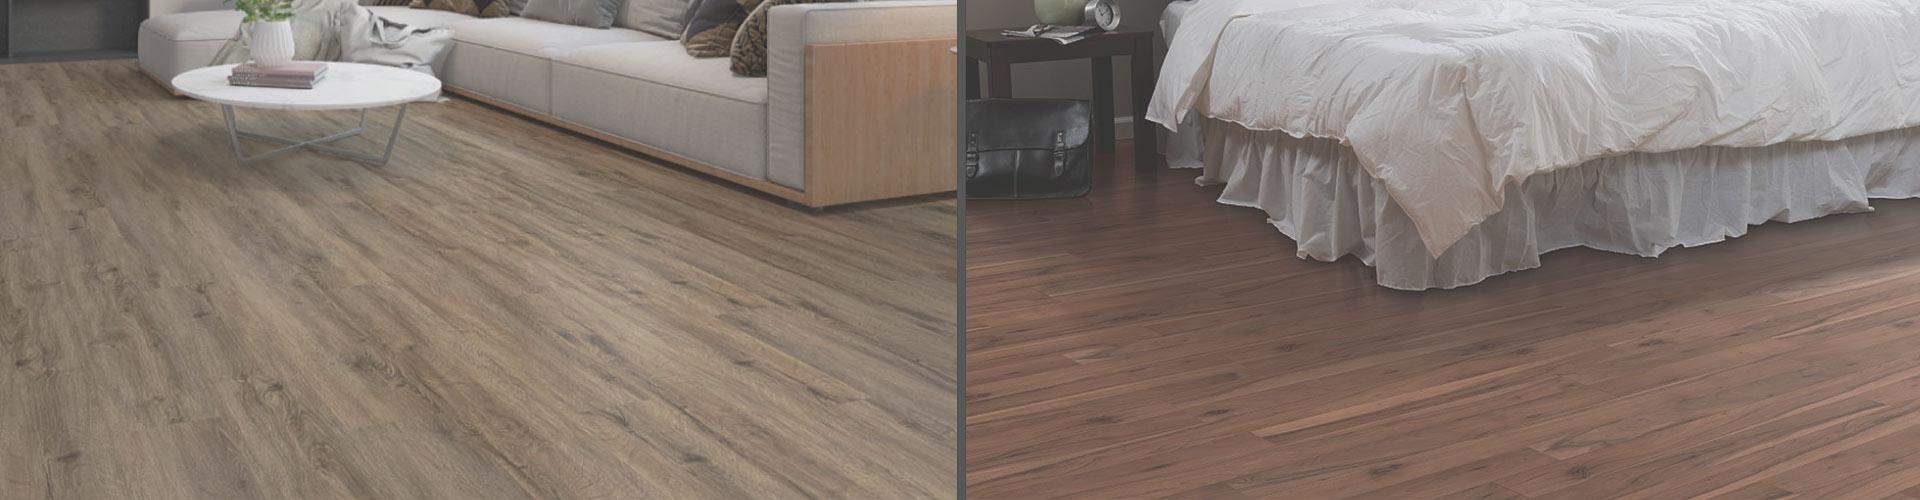 Hardwood Floor Refinishing in Bay Shore NY, East Setauket NY, Smithtown